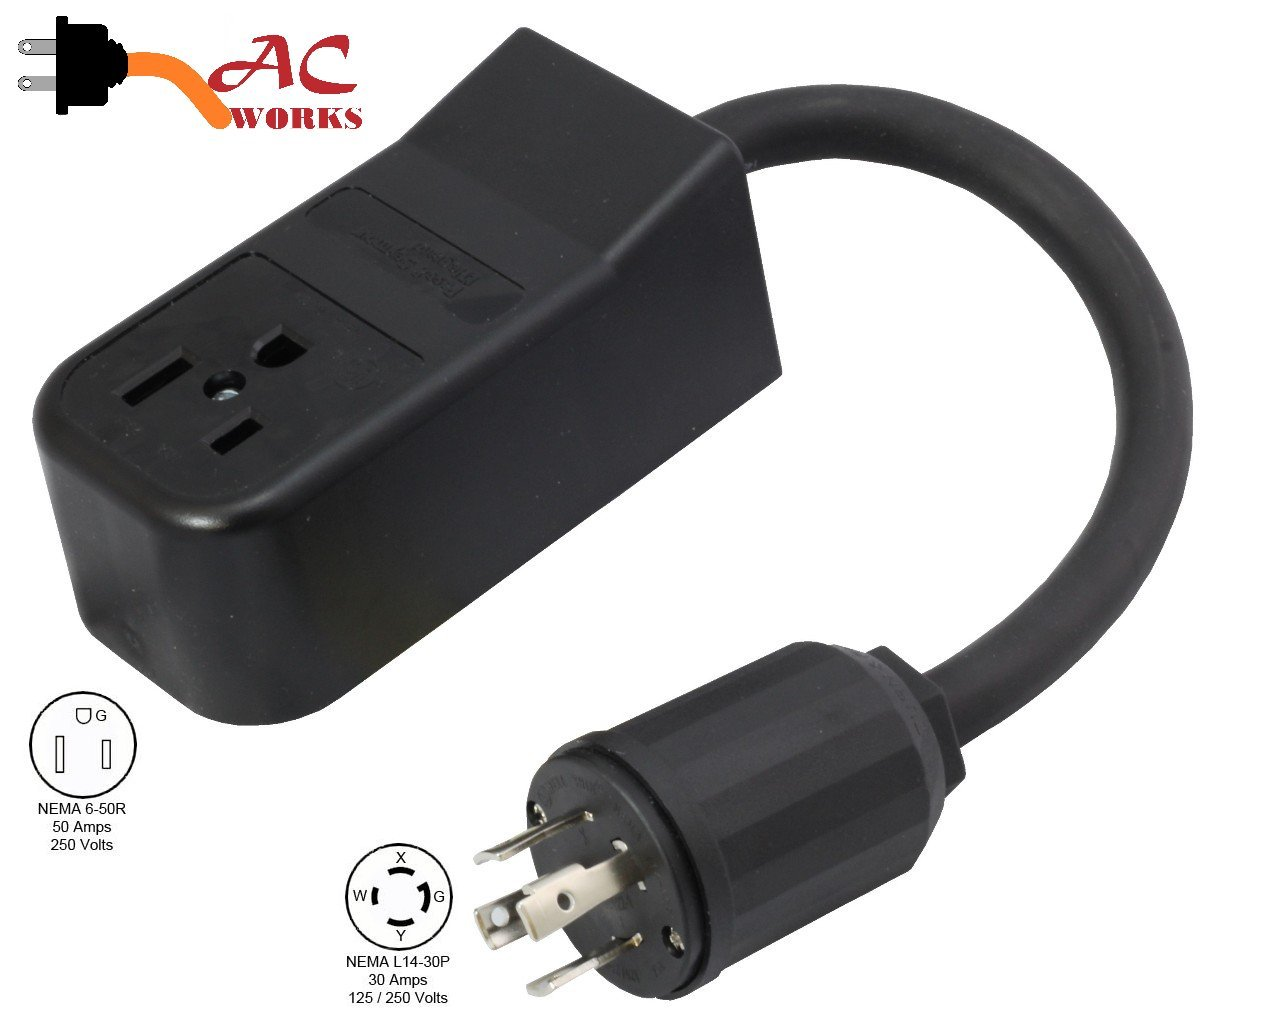 Generator Welder Adapter Cord Outlet Plug L14-30 4-Prong NEMA 6-50R L1430650-018